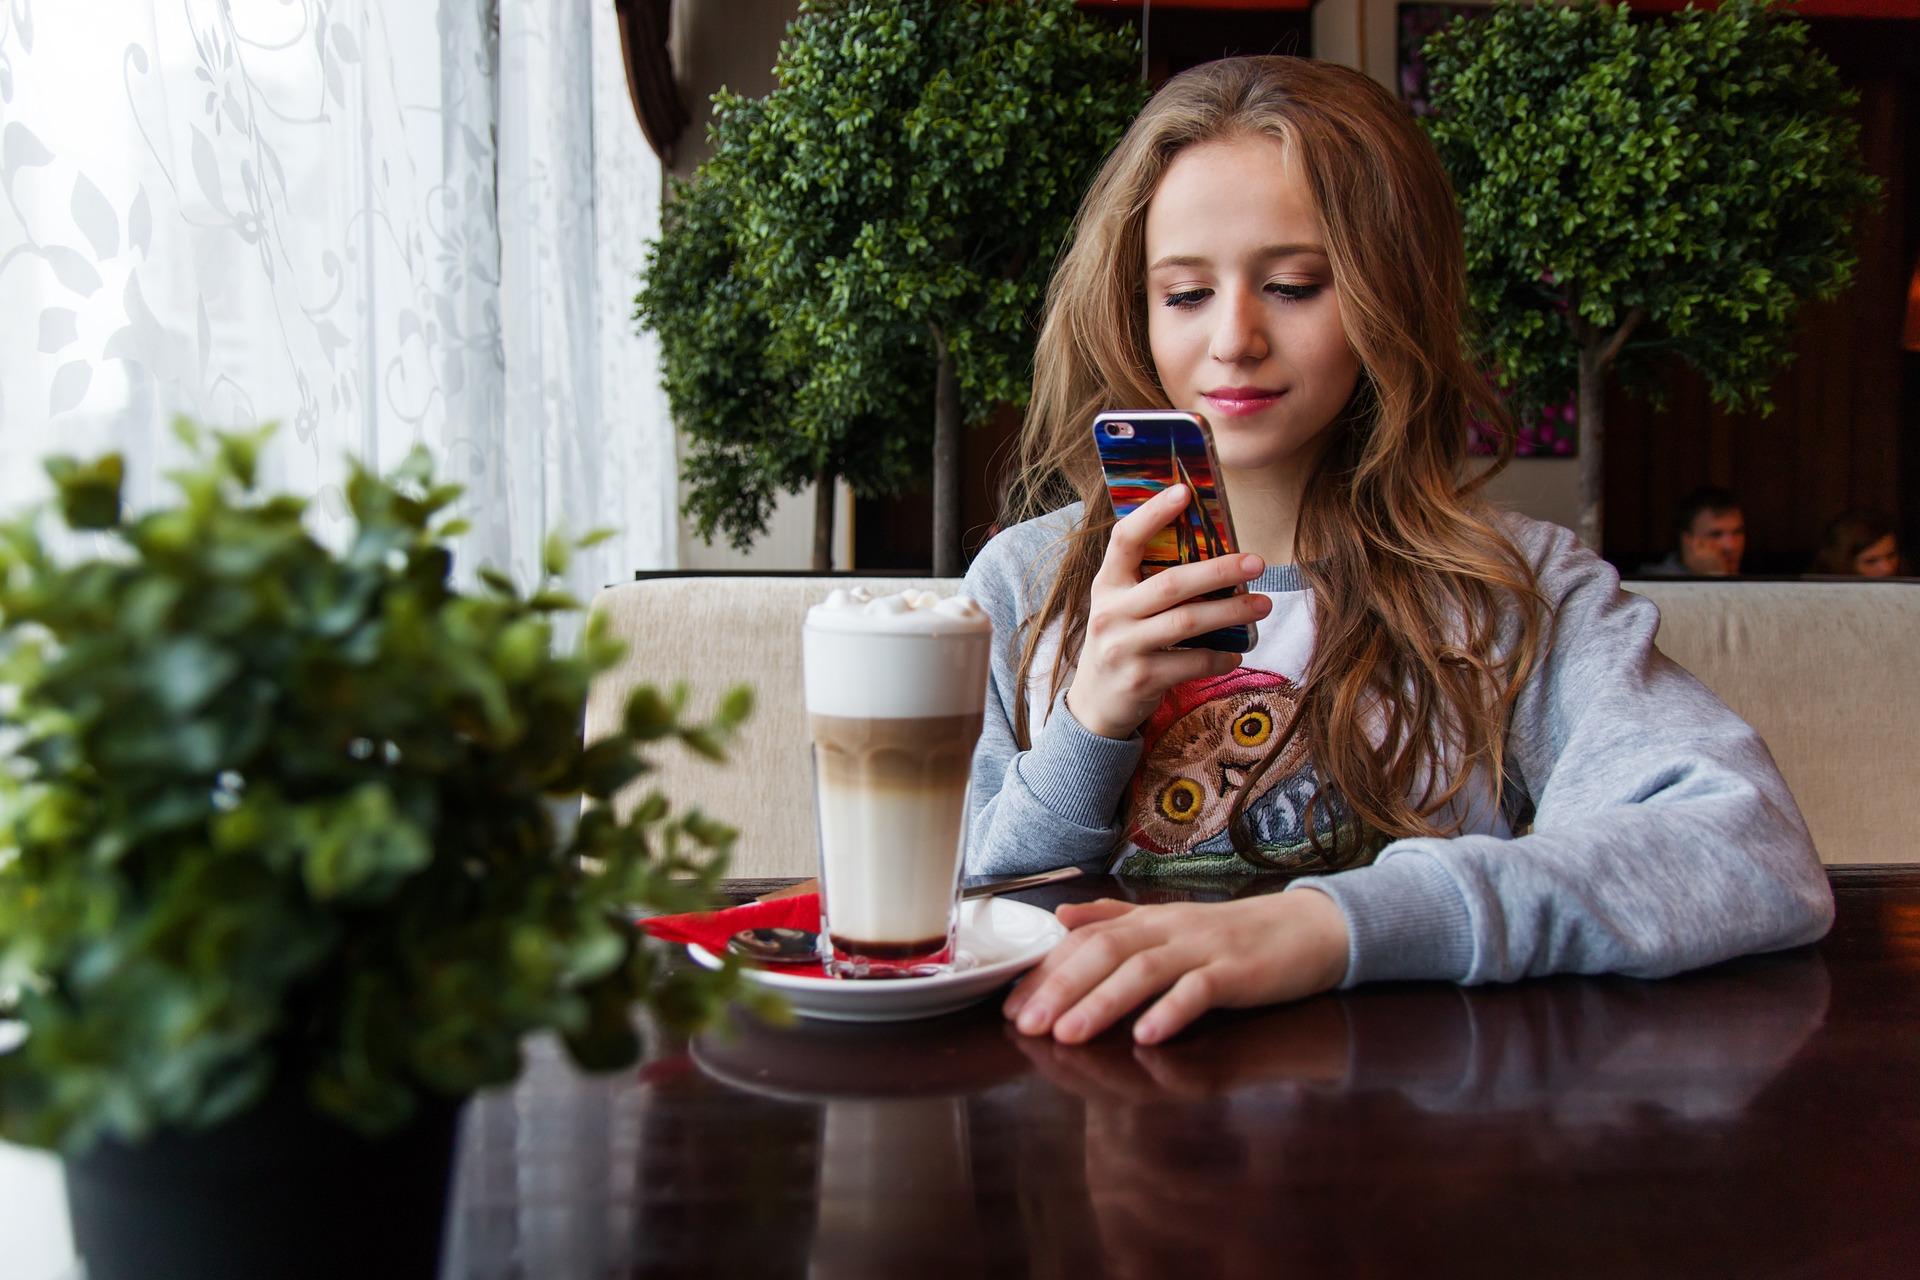 editoria digitale lo smartphone